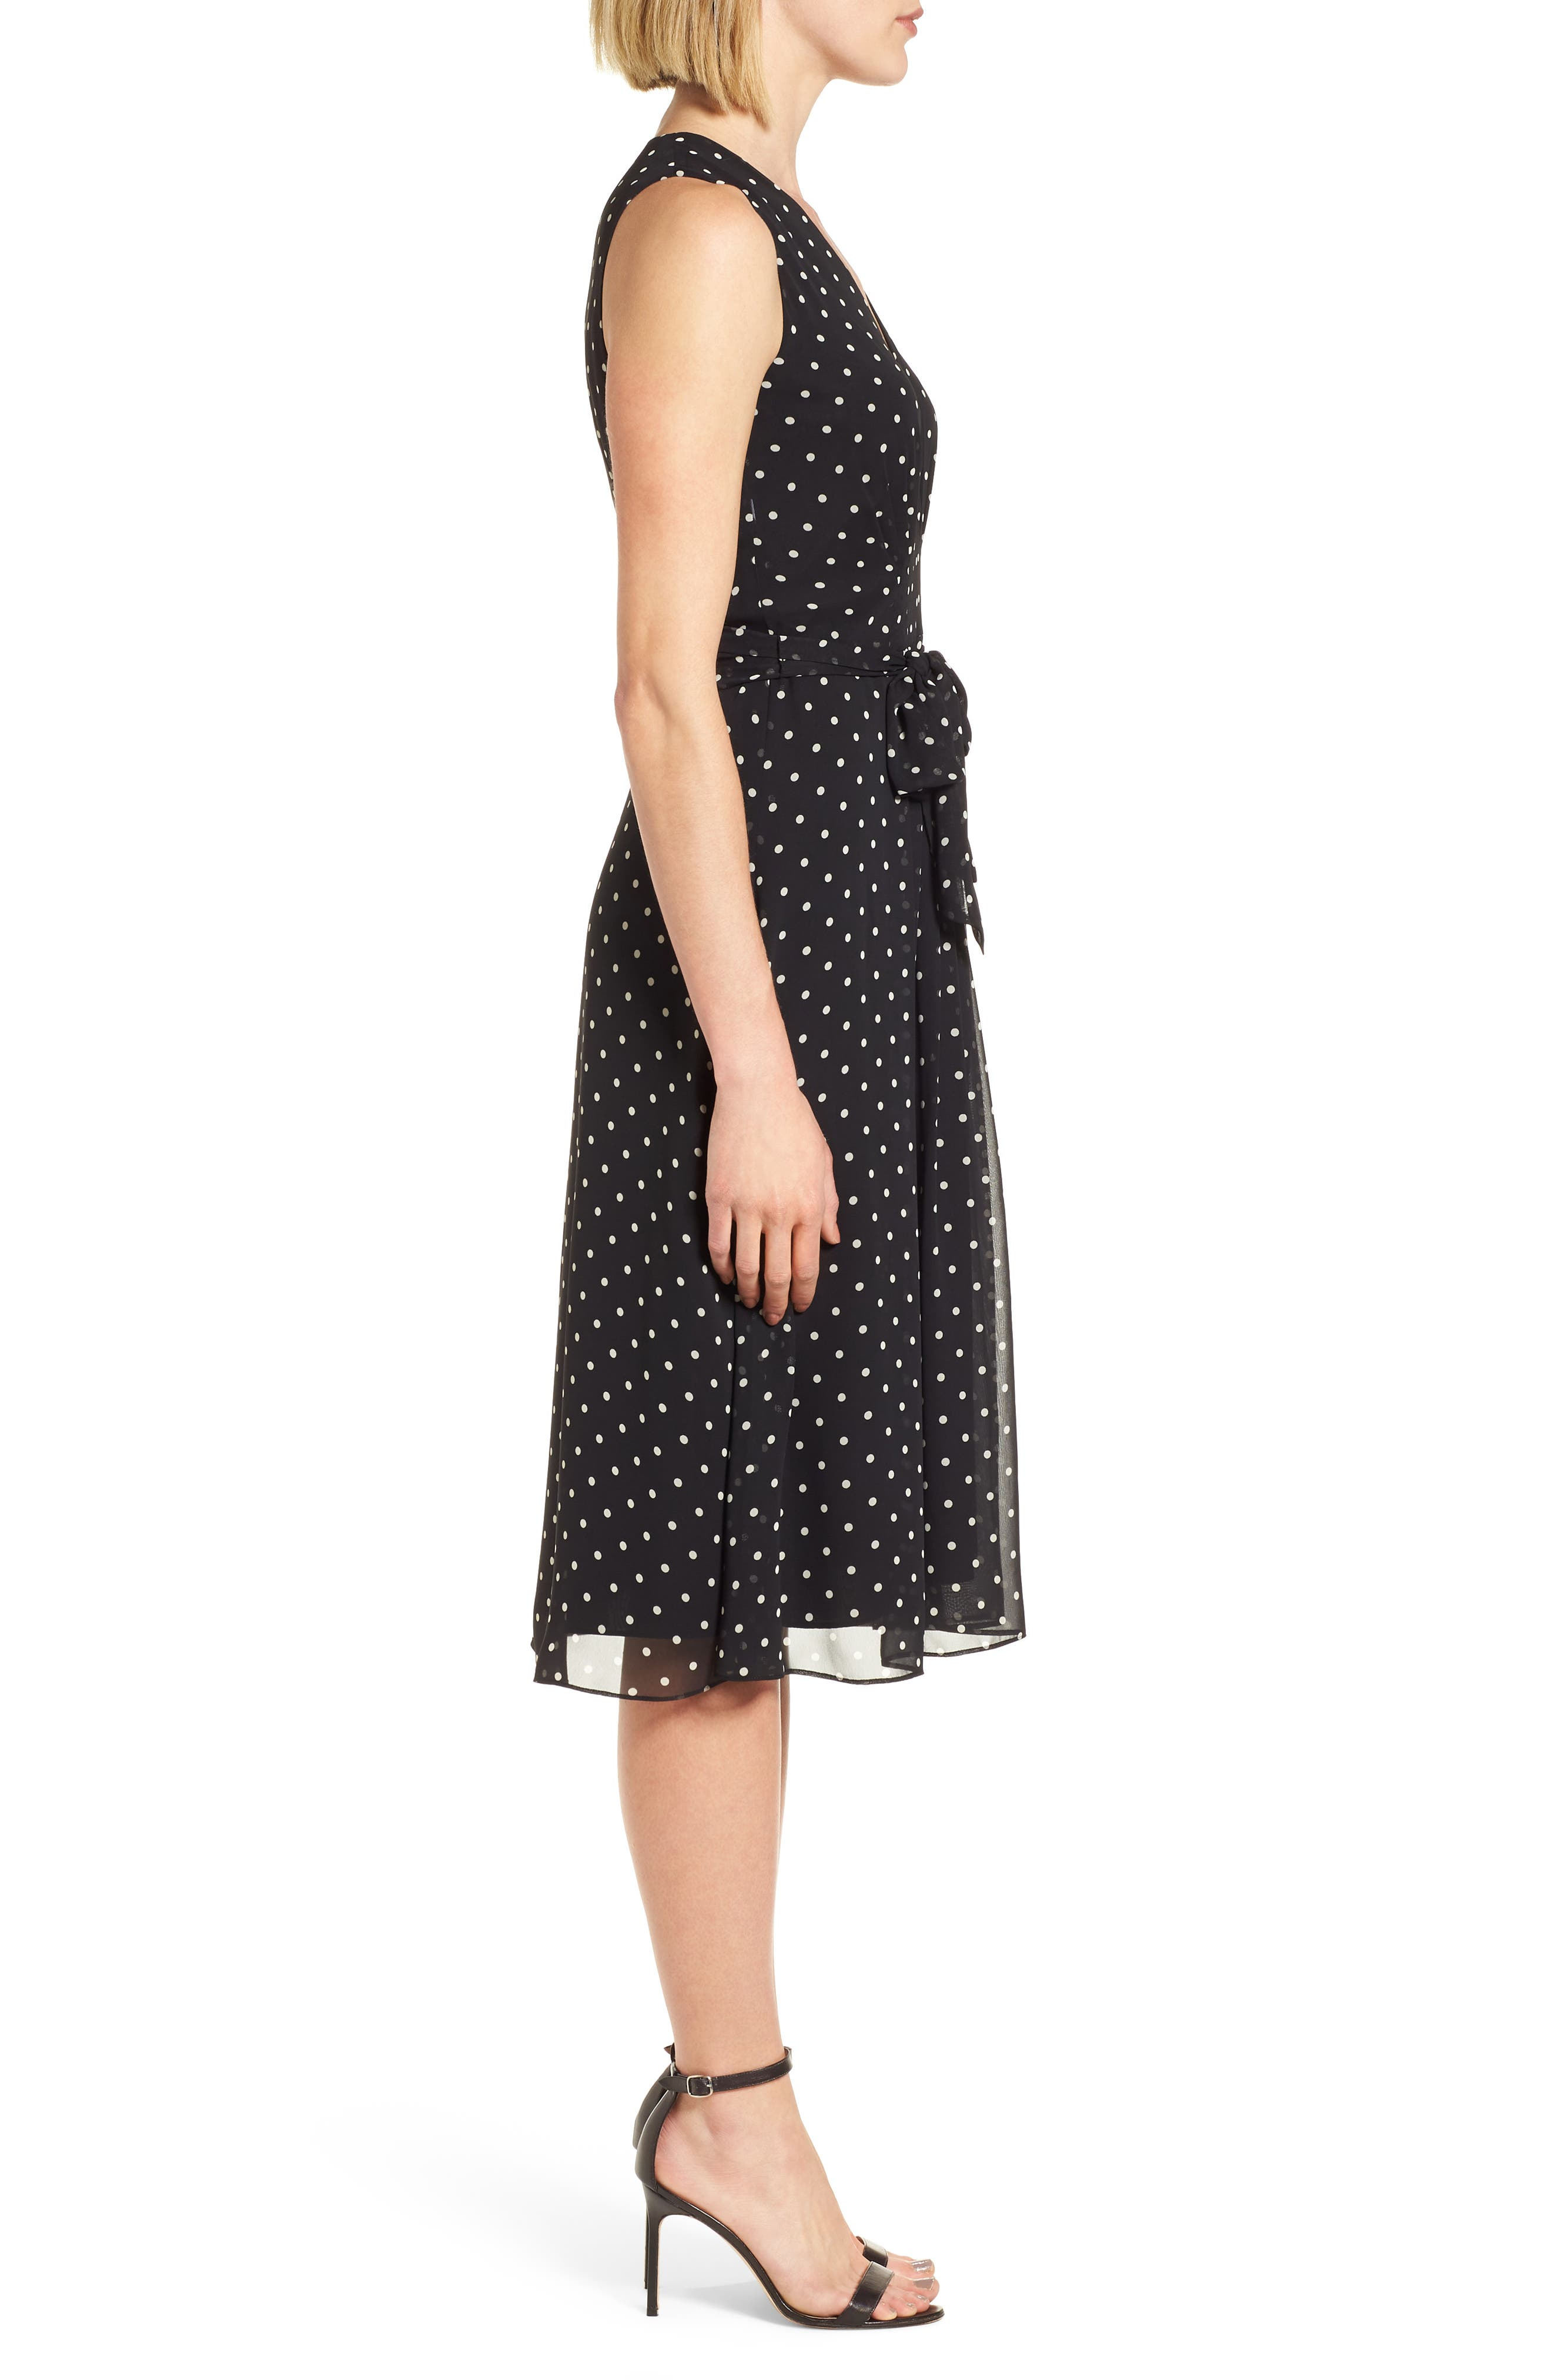 New York Dotted Chiffon Dress,                             Alternate thumbnail 3, color,                             Black/ White